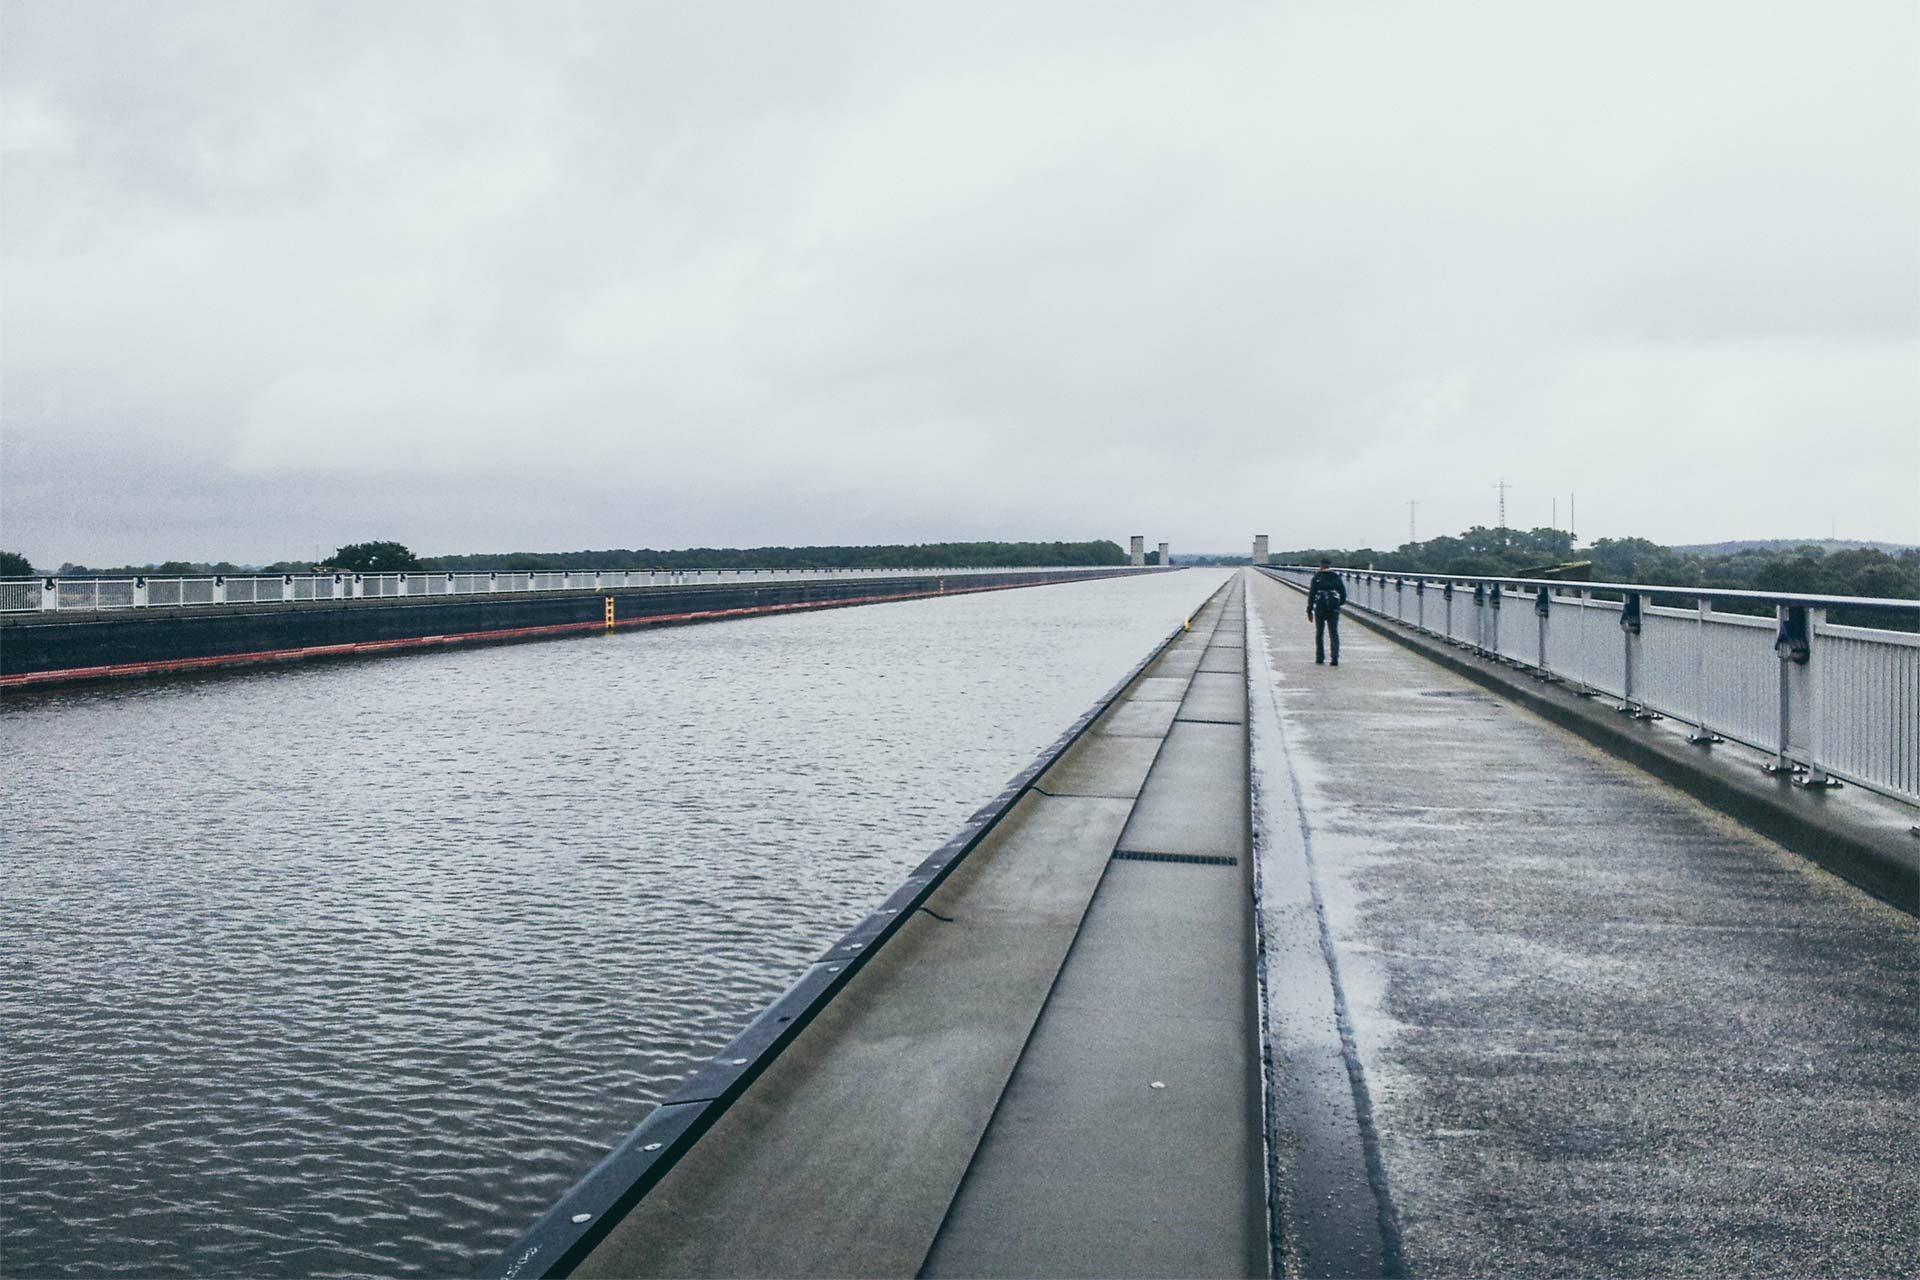 Fast 1 Kilometer lang ist die Trogbrücke des Mittellandkanals.